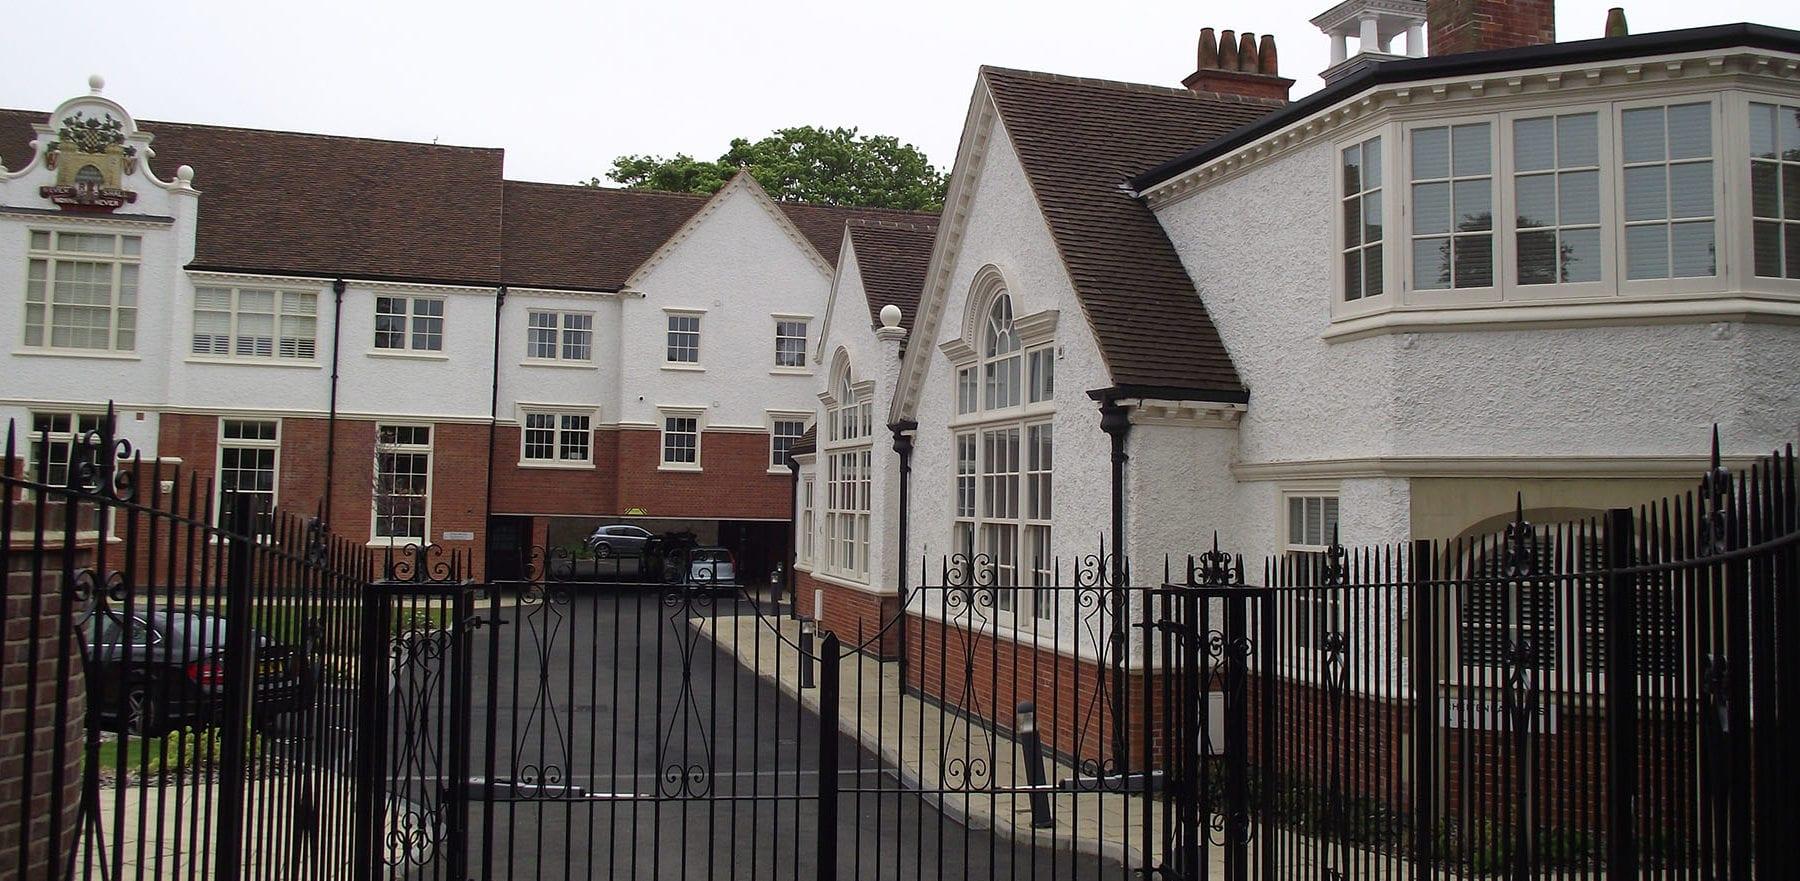 Lifestiles - Handmade Restoration Clay Roof Tiles - Redhill, England 3